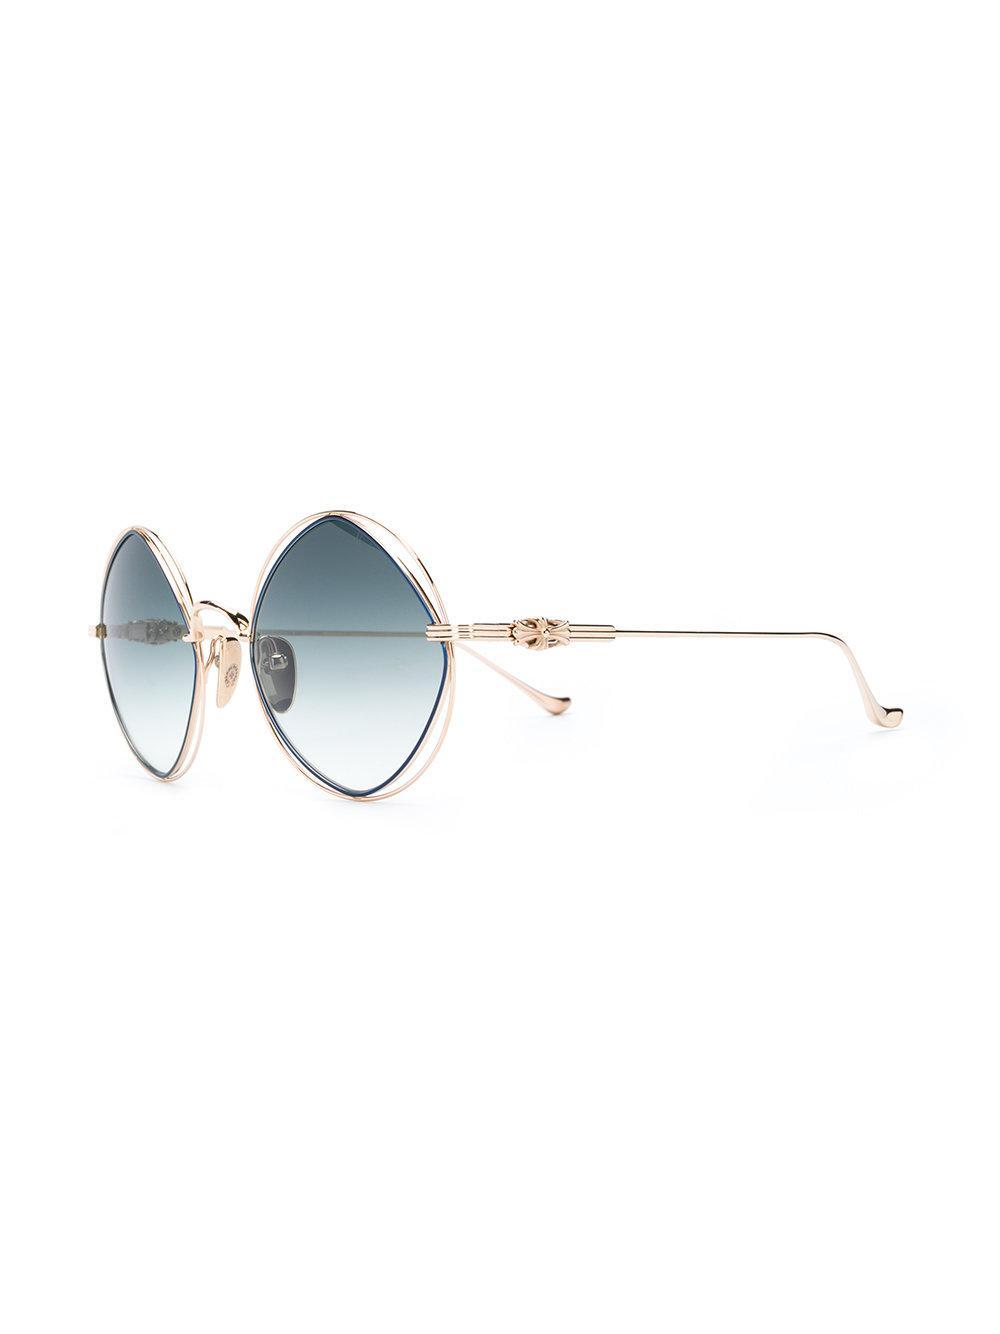 d3efea0cf5 Chrome Hearts - Metallic Round Frame Sunglasses - Lyst. View fullscreen